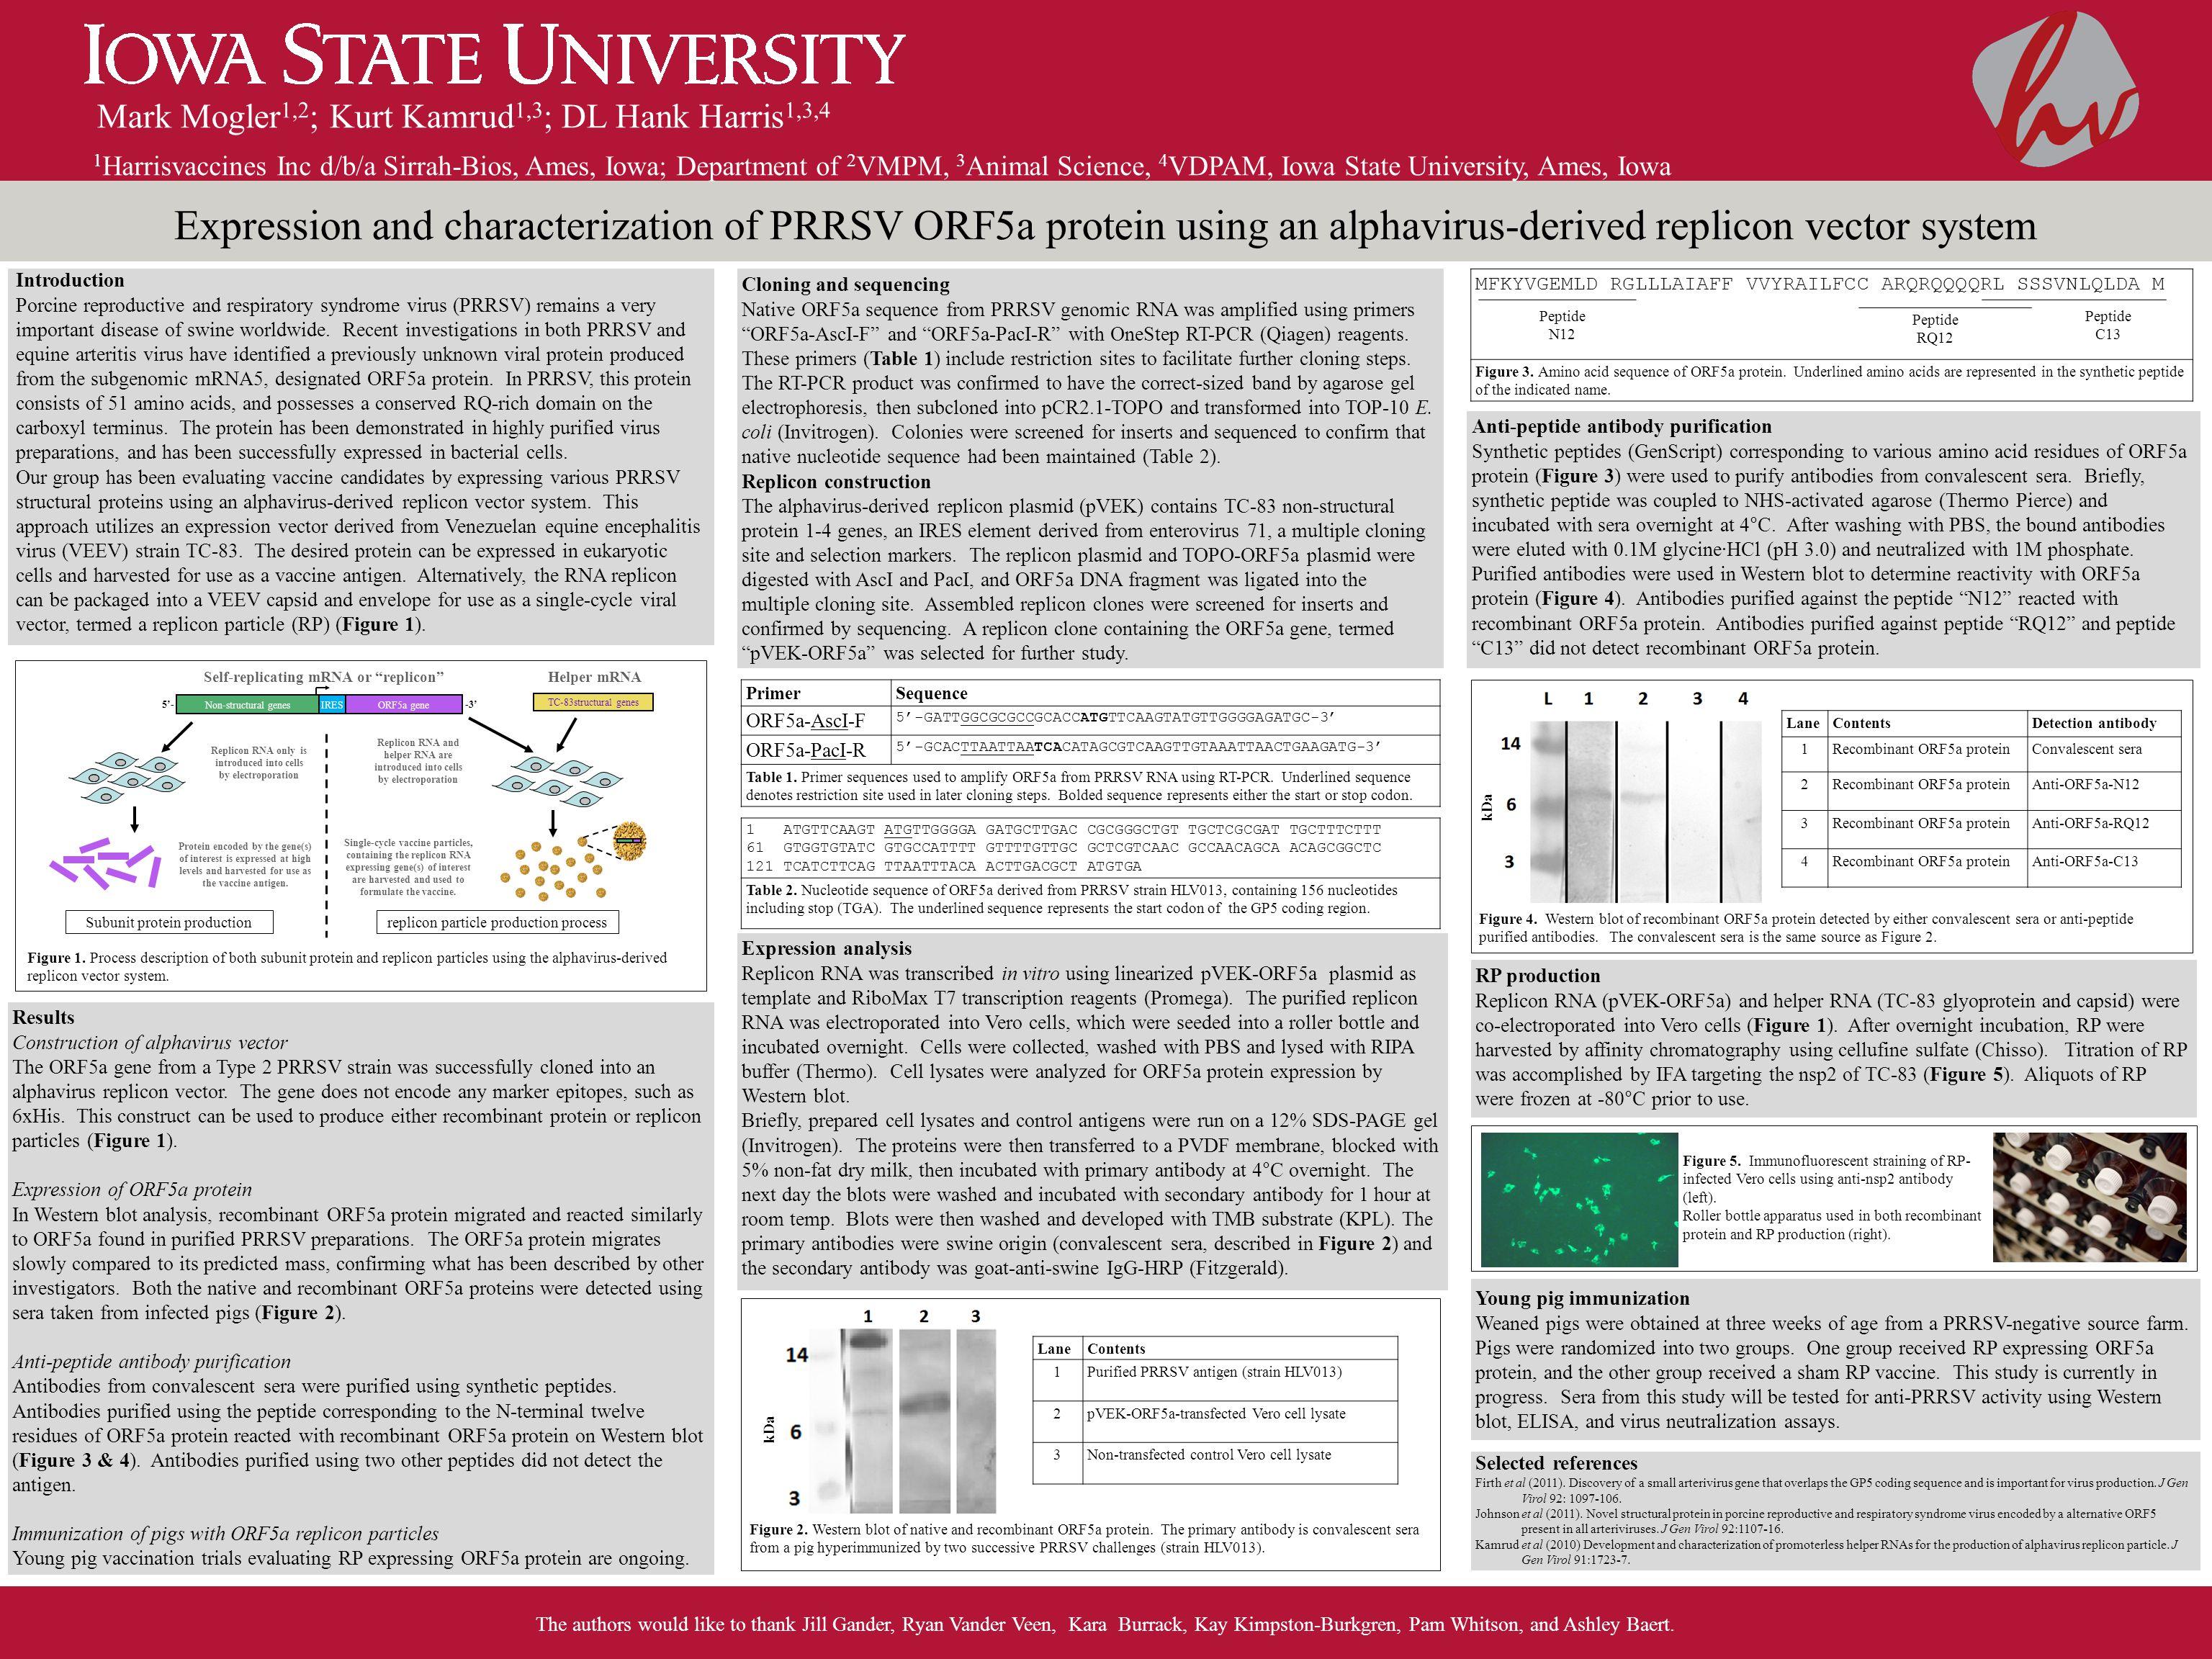 Expression and characterization of PRRSV ORF5a protein using an alphavirus-derived replicon vector system Mark Mogler 1,2 ; Kurt Kamrud 1,3 ; DL Hank Harris 1,3,4 The authors would like to thank Jill Gander, Ryan Vander Veen, Kara Burrack, Kay Kimpston-Burkgren, Pam Whitson, and Ashley Baert.